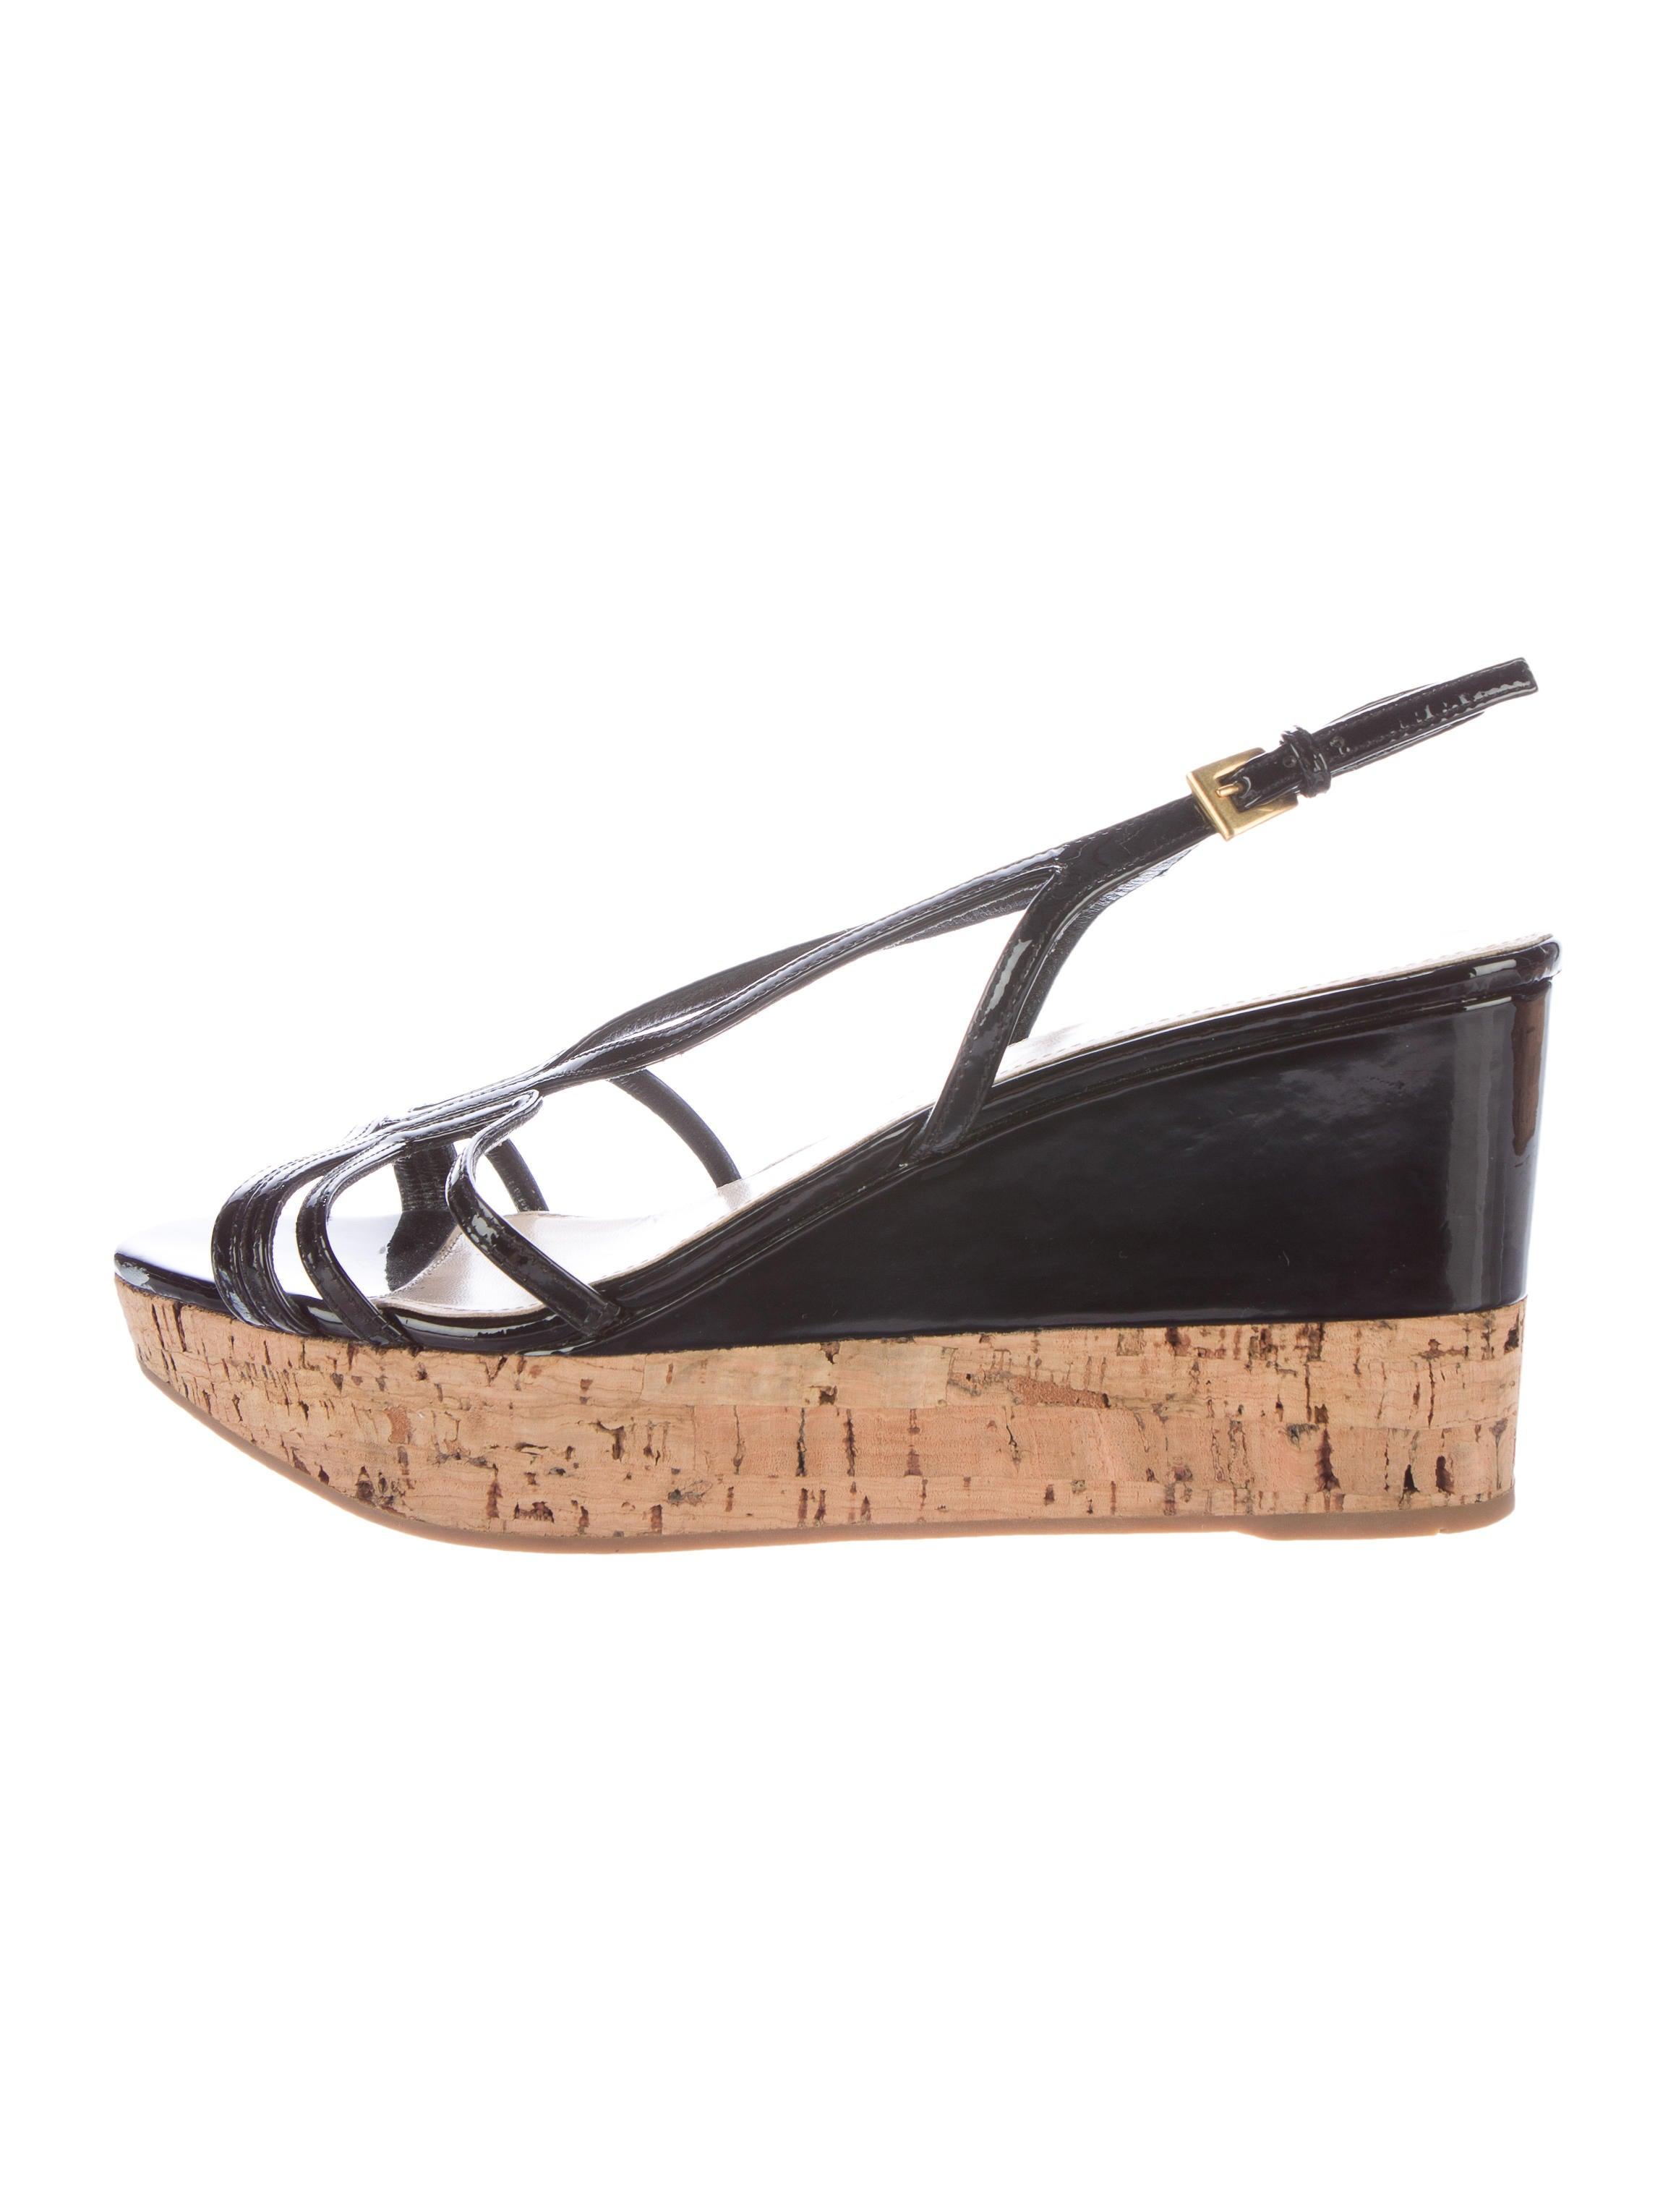 d5288e597 Prada Black Patent Sandals